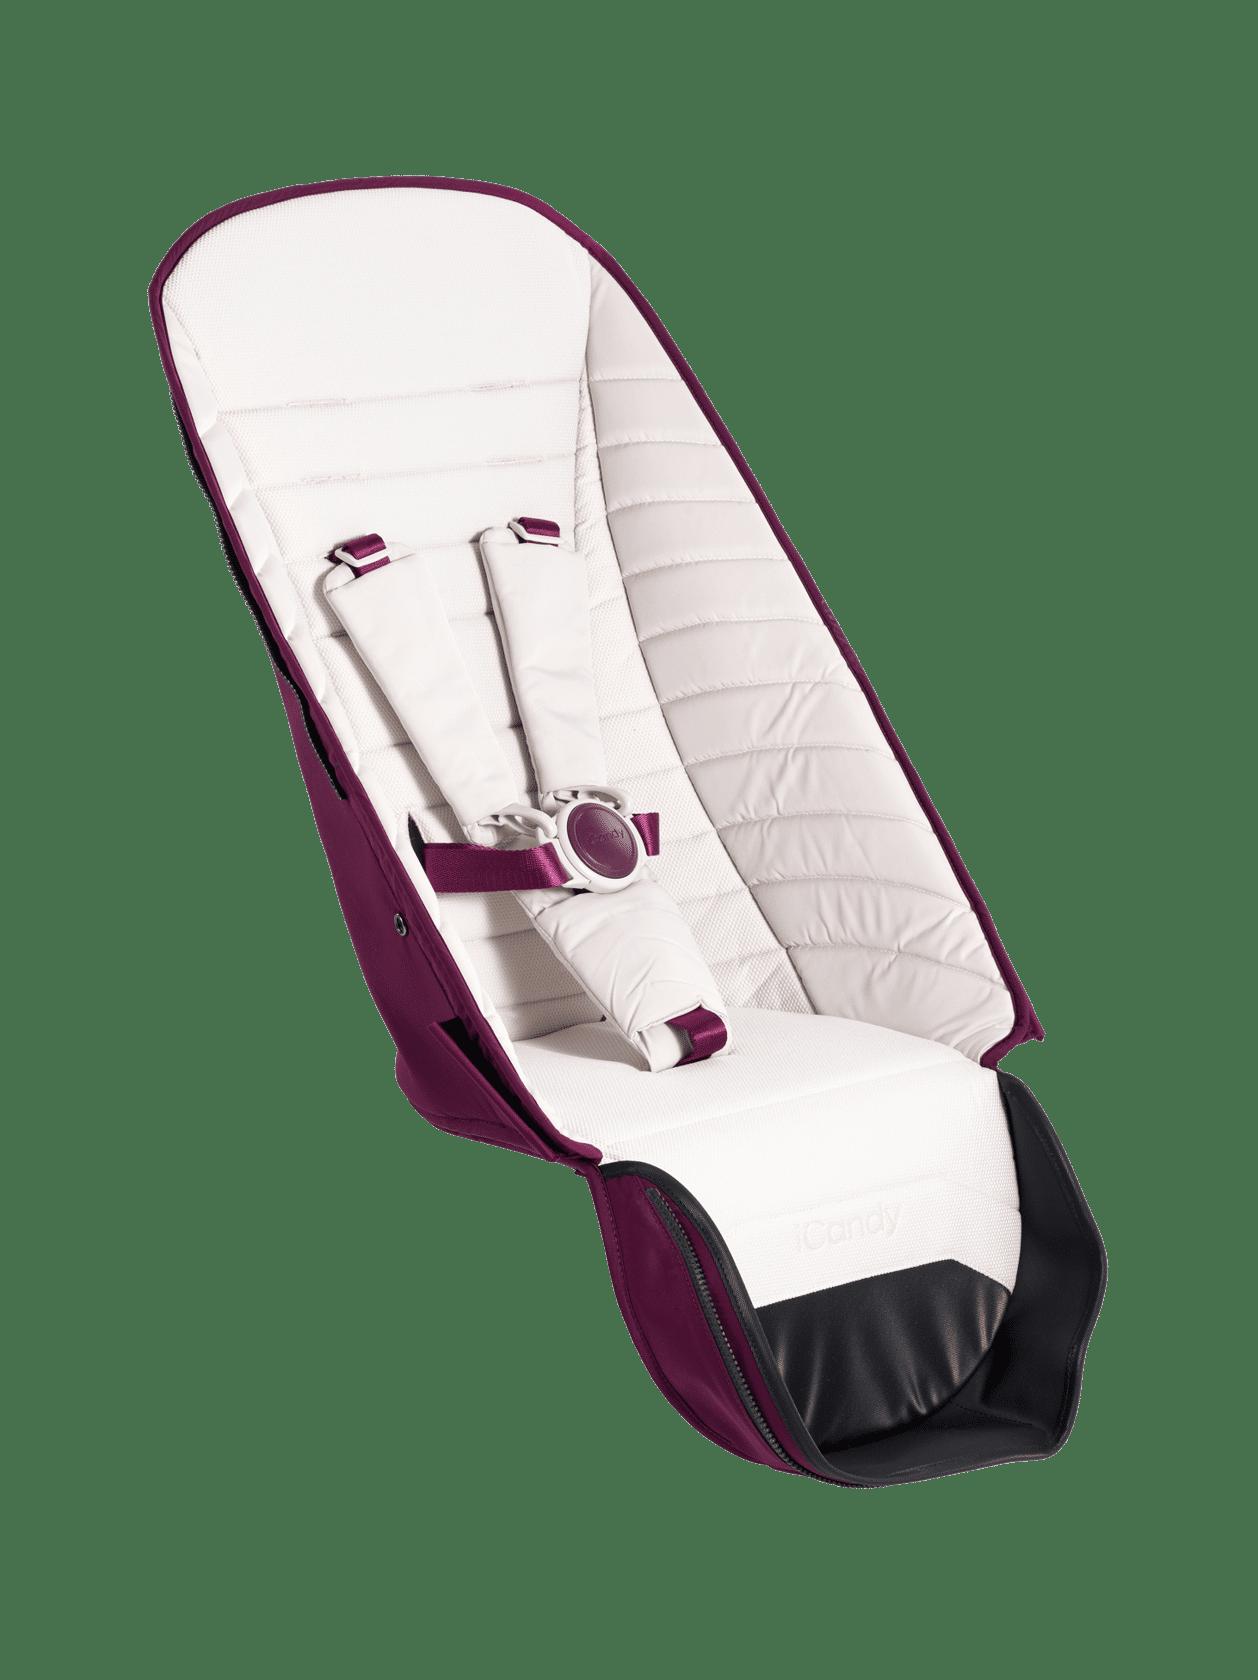 Peach 2nd Seat Fabric - Damson